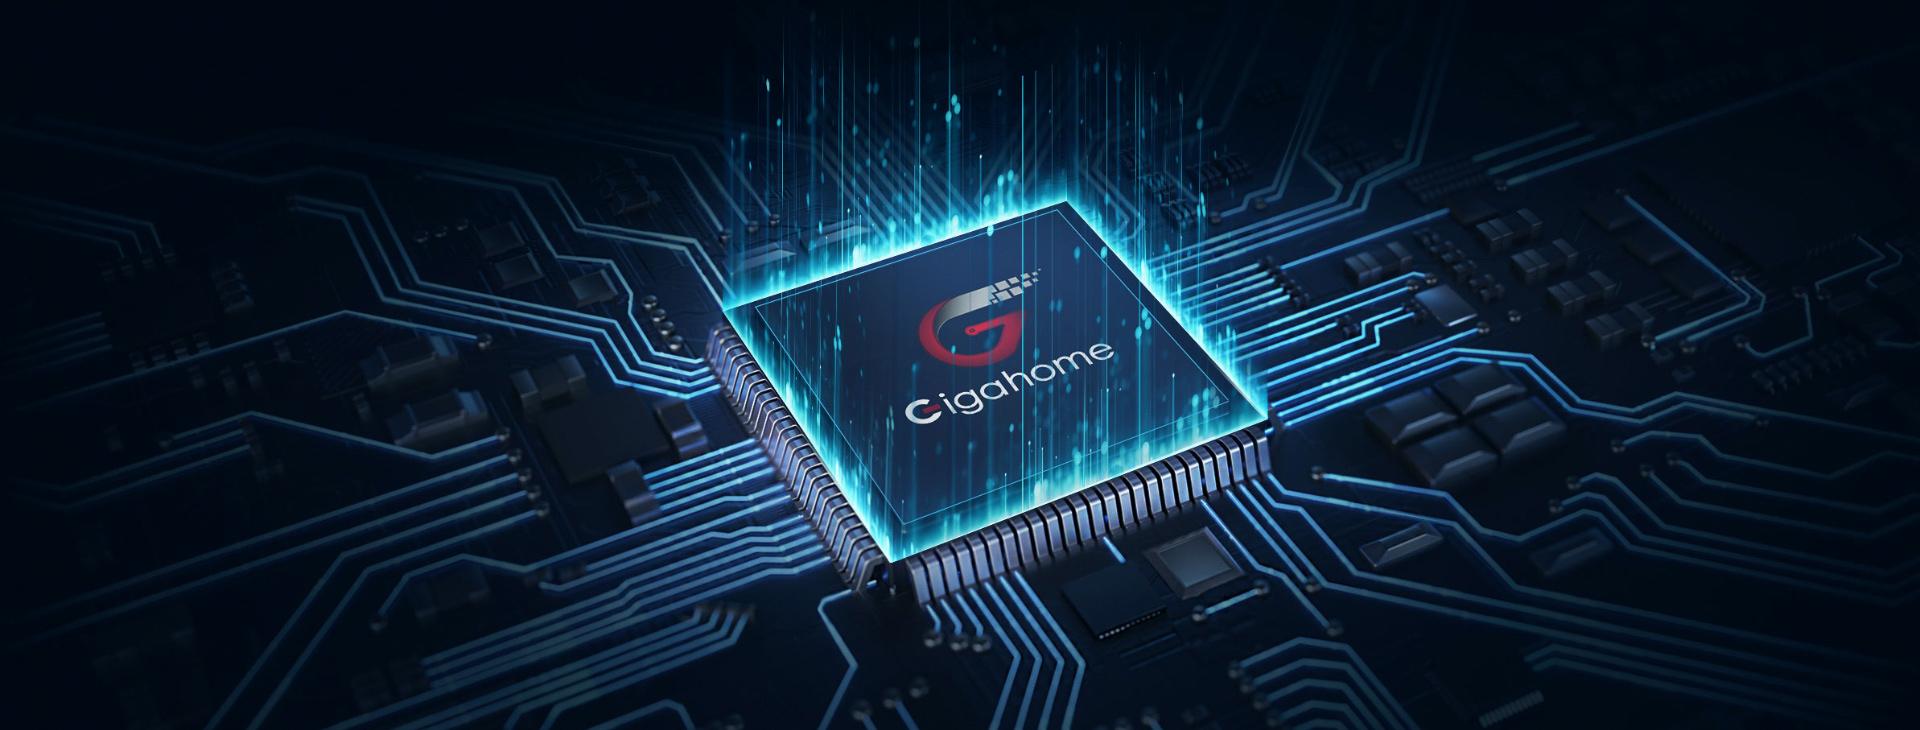 Gigahome quad-core 1.4 GHz CPU